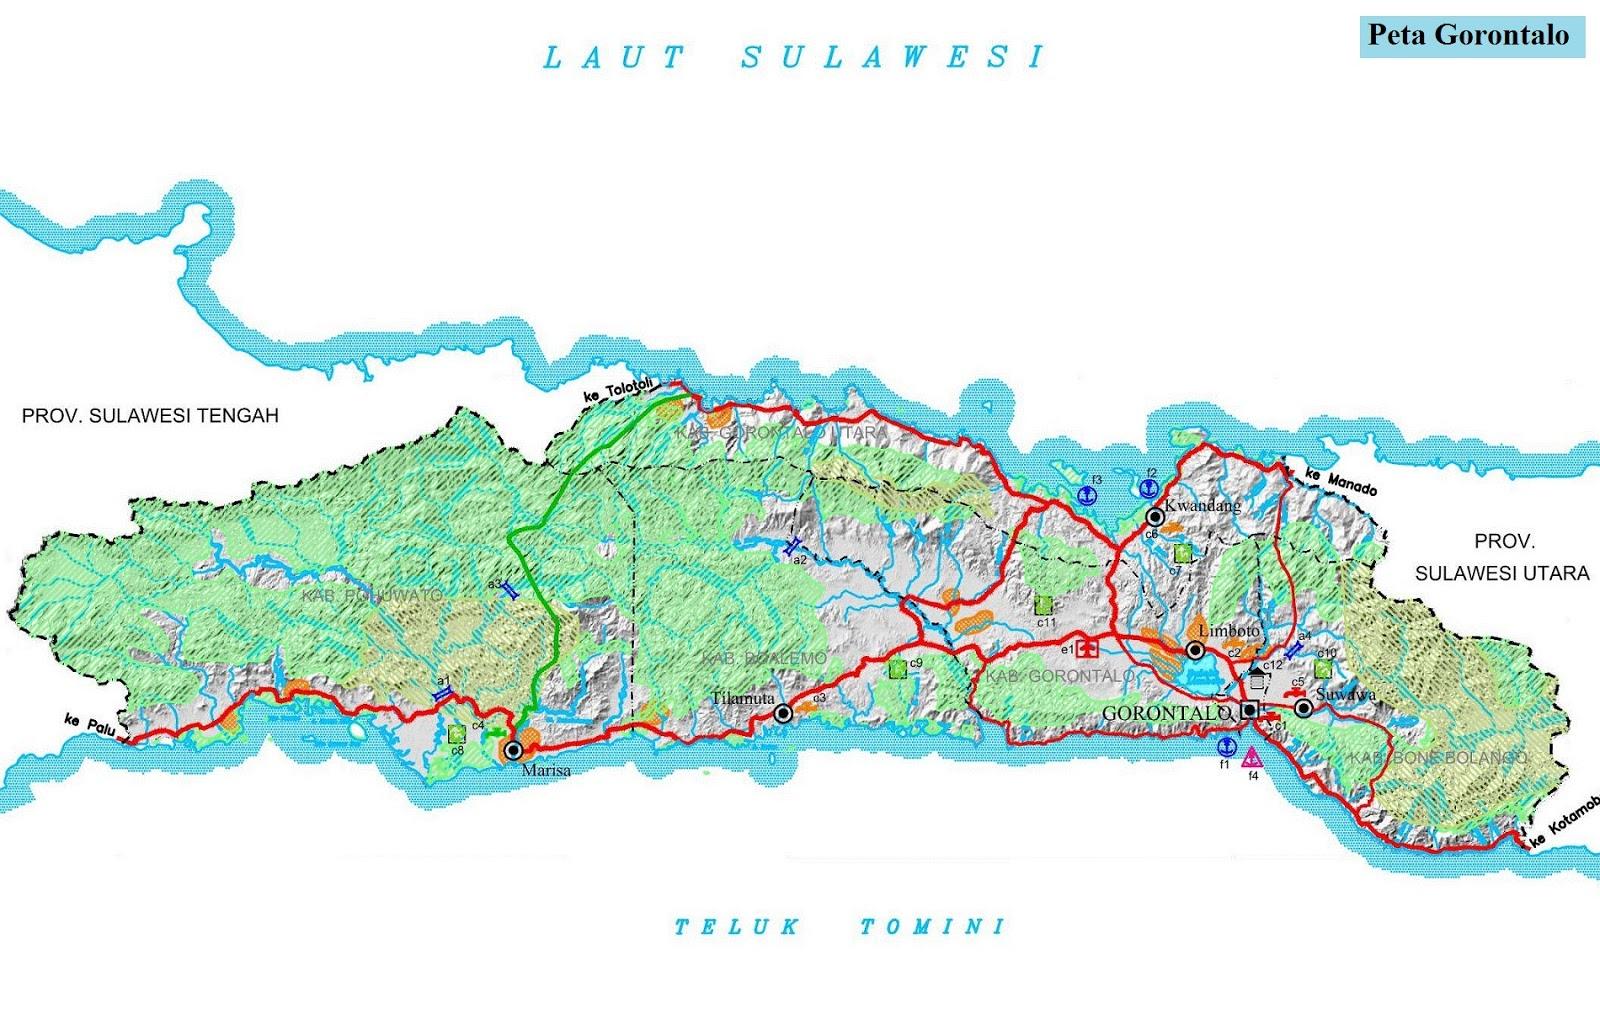 Peta Gorontalo HD